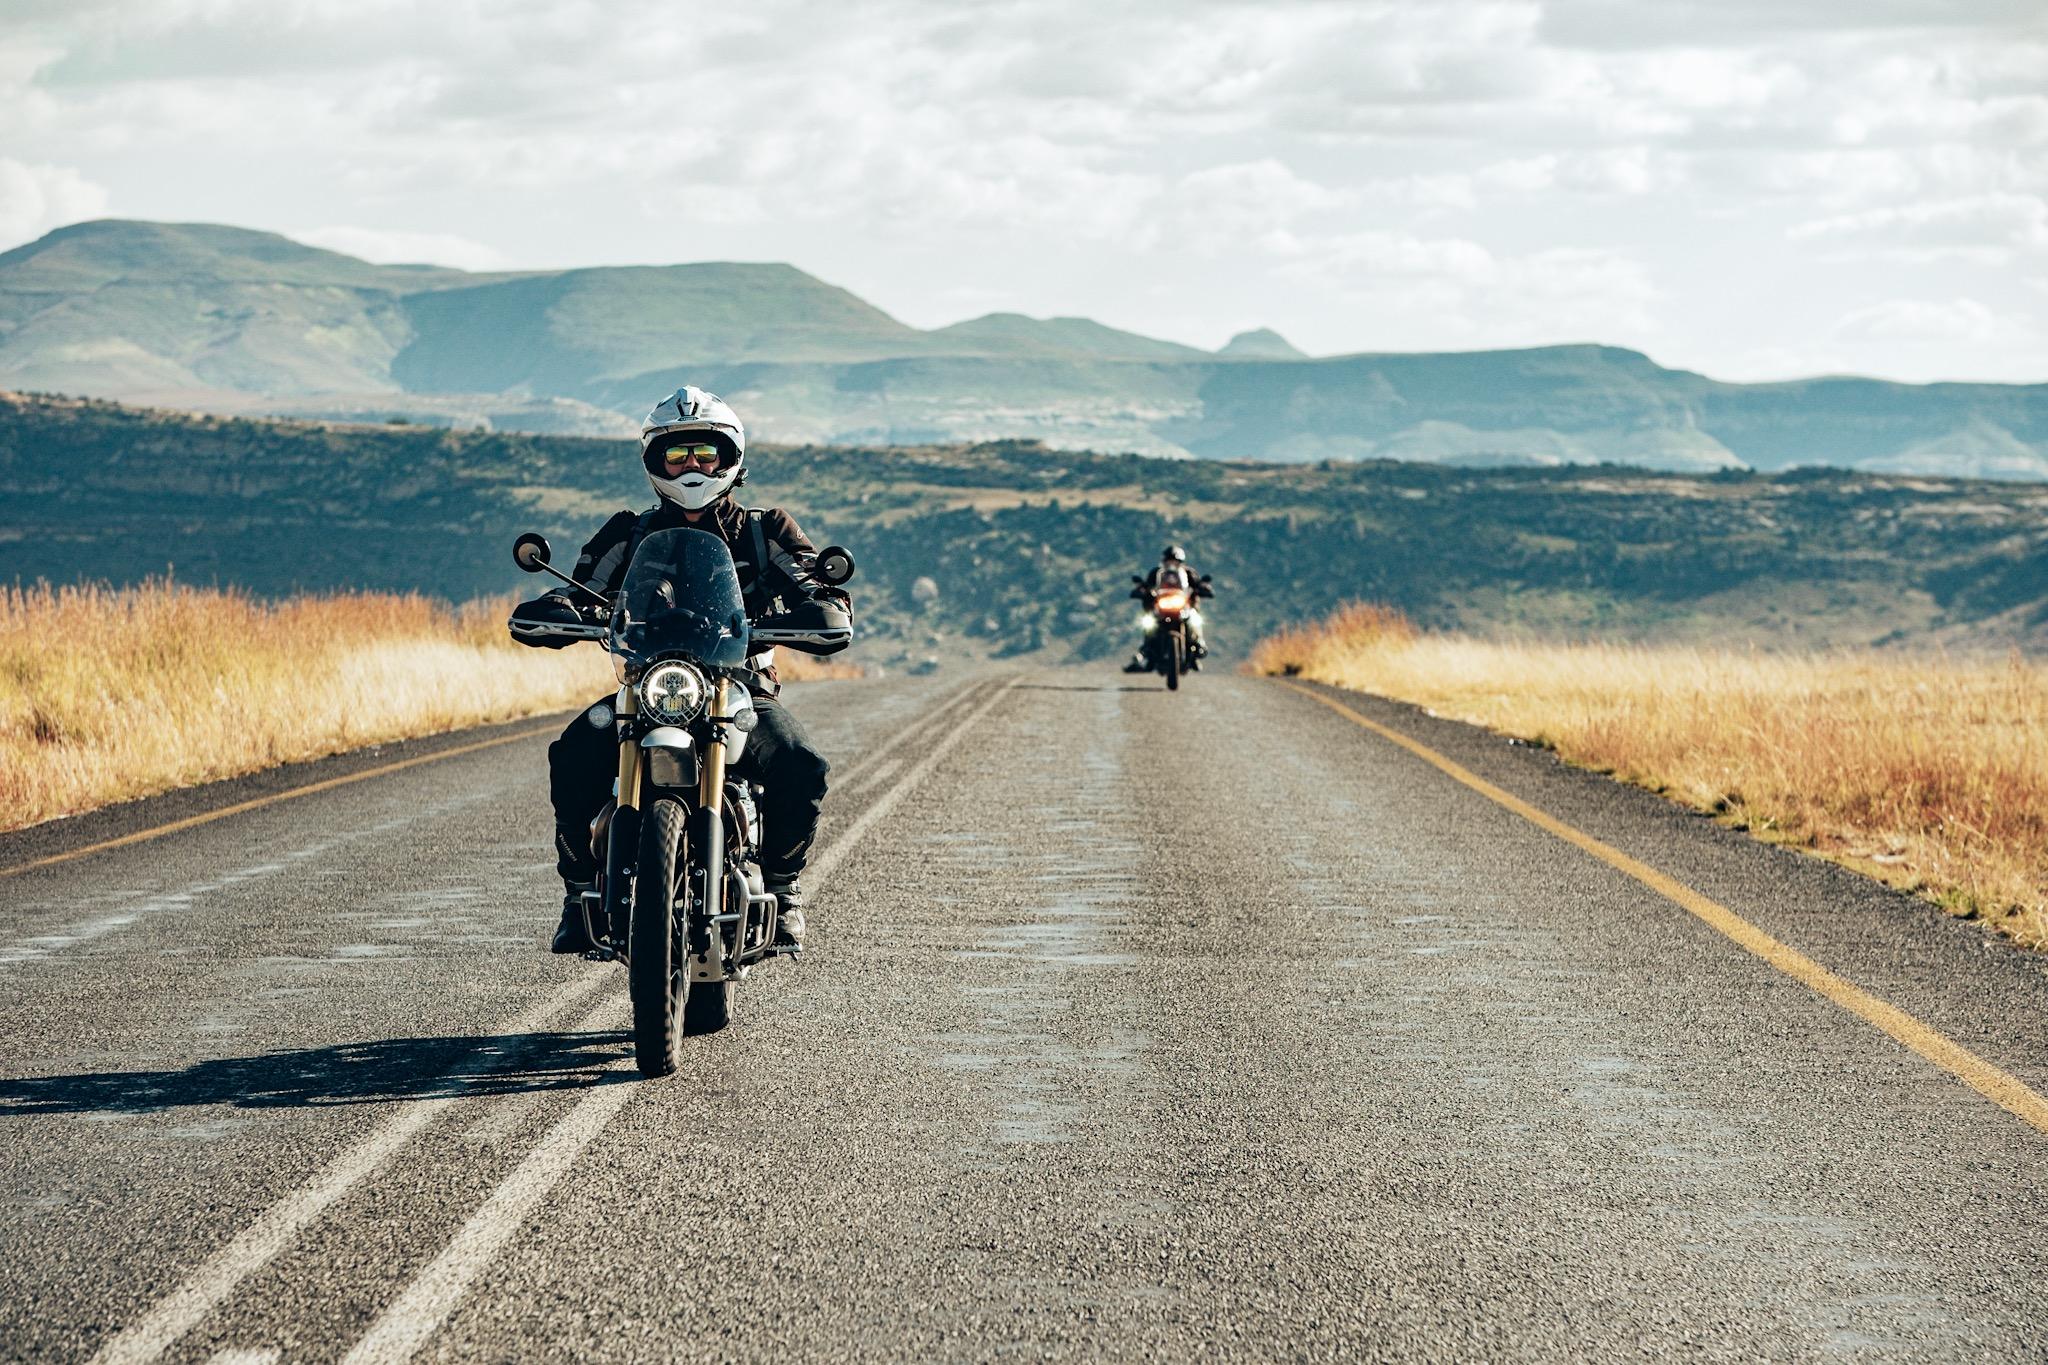 The 1200 Scrambler cruising through Golden Gate National Park on the Bonafide Moto Co Sani Pass Adventure